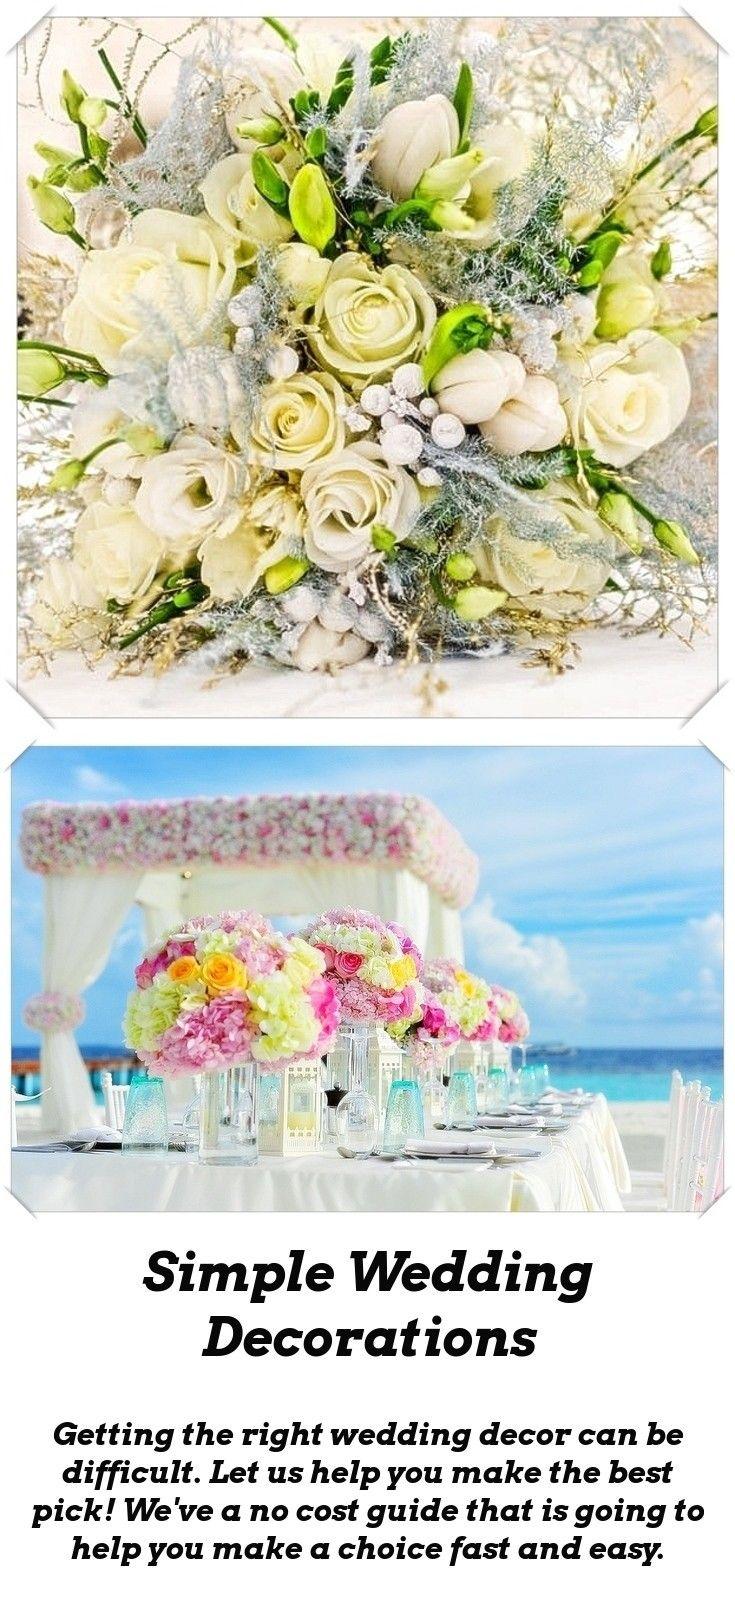 Simple wedding decoration ideas for reception  Wedding Decoration Ideas  Pinterest  Reception Wedding and Wedding